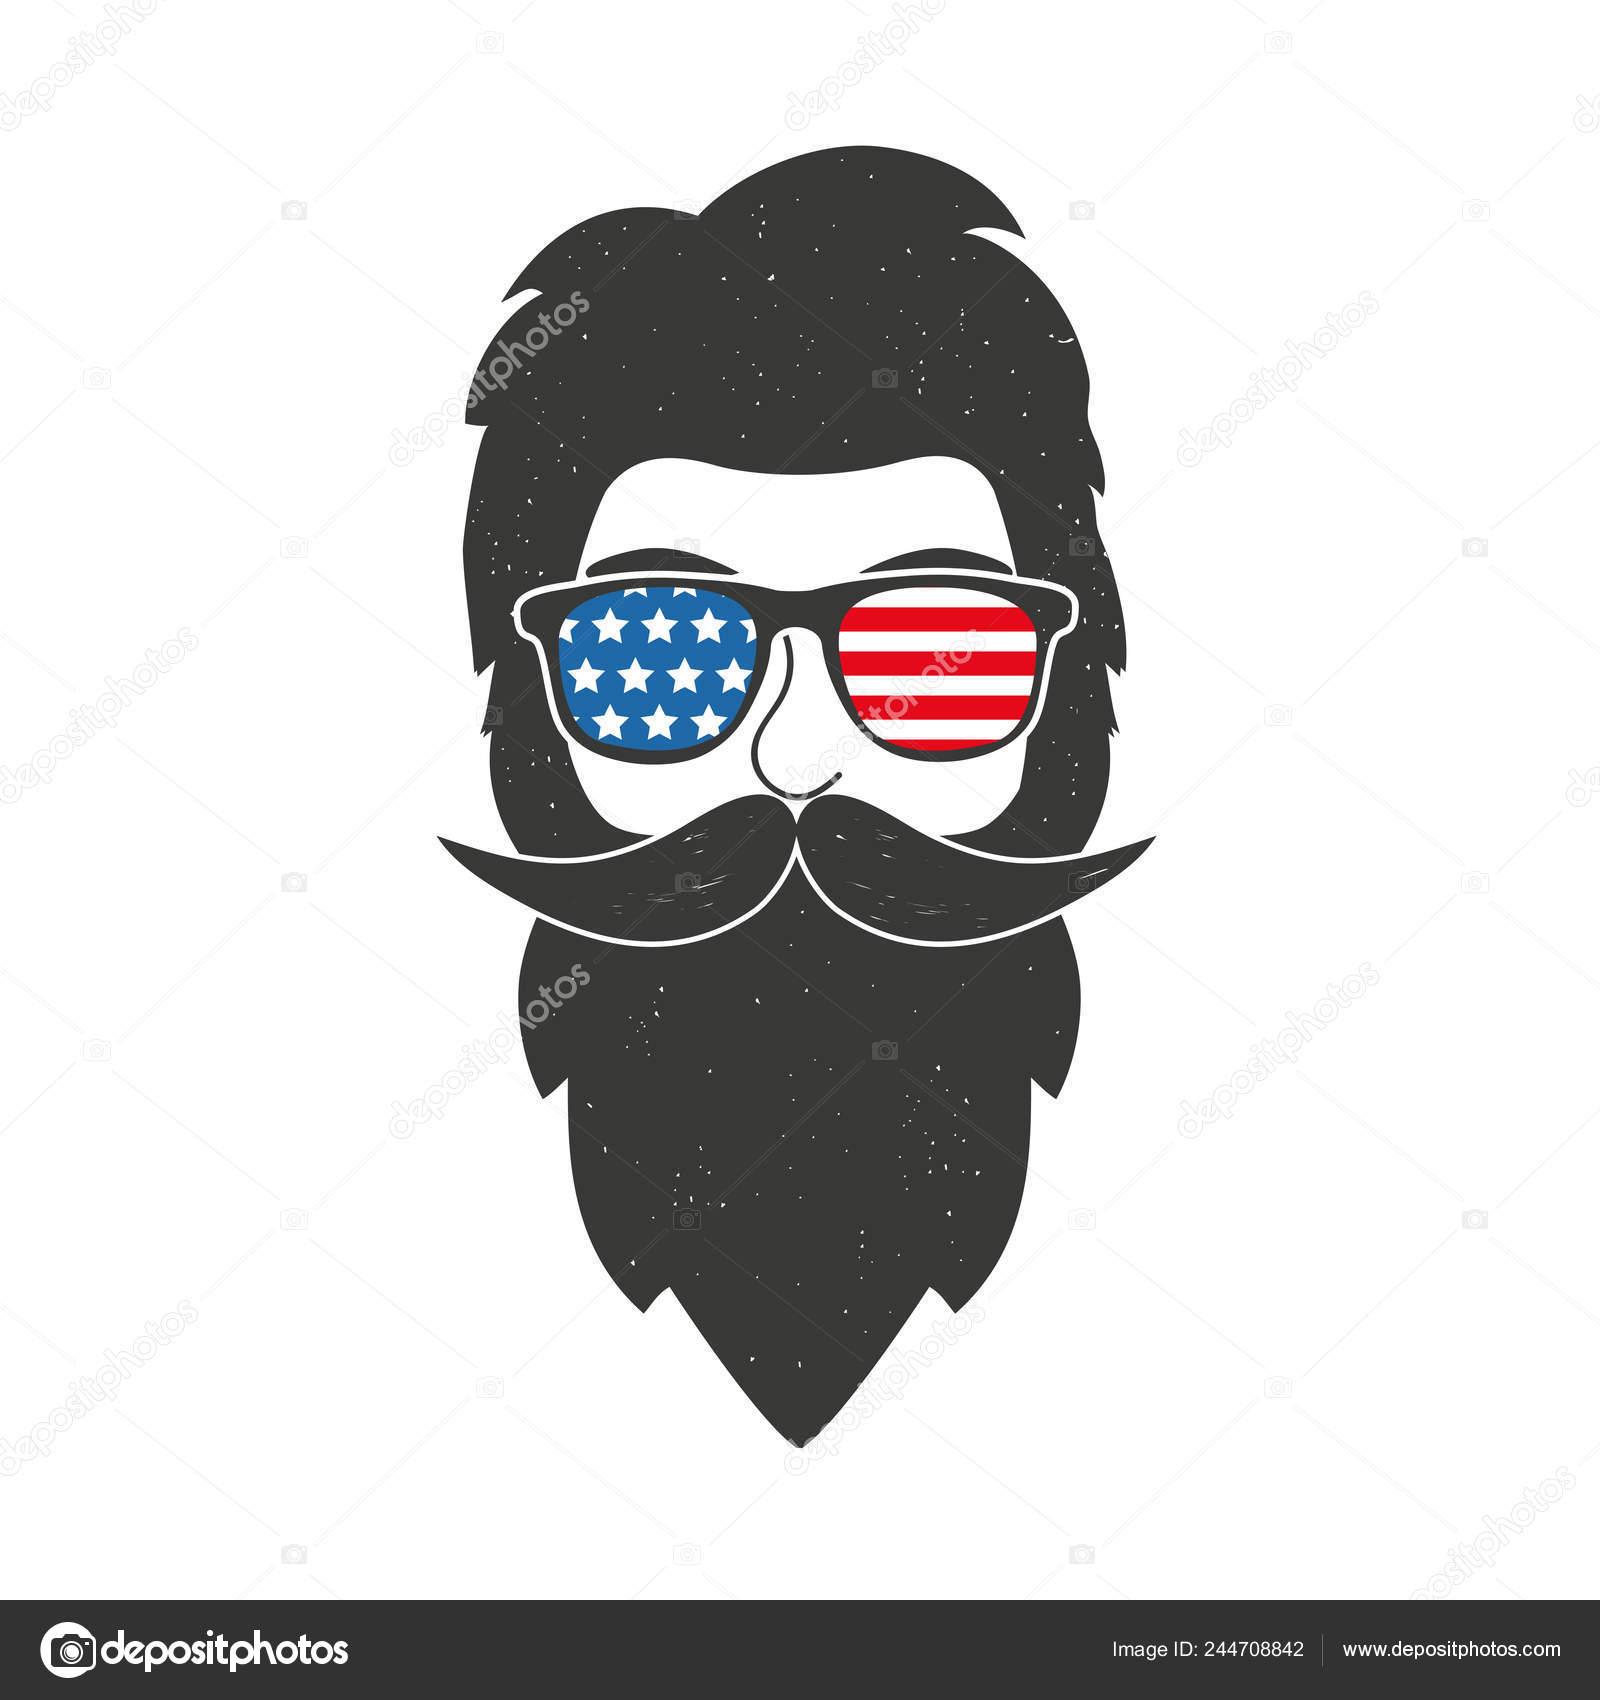 05844049deb National American Print Design 4Th July Memorial Day Card — Stock Vector